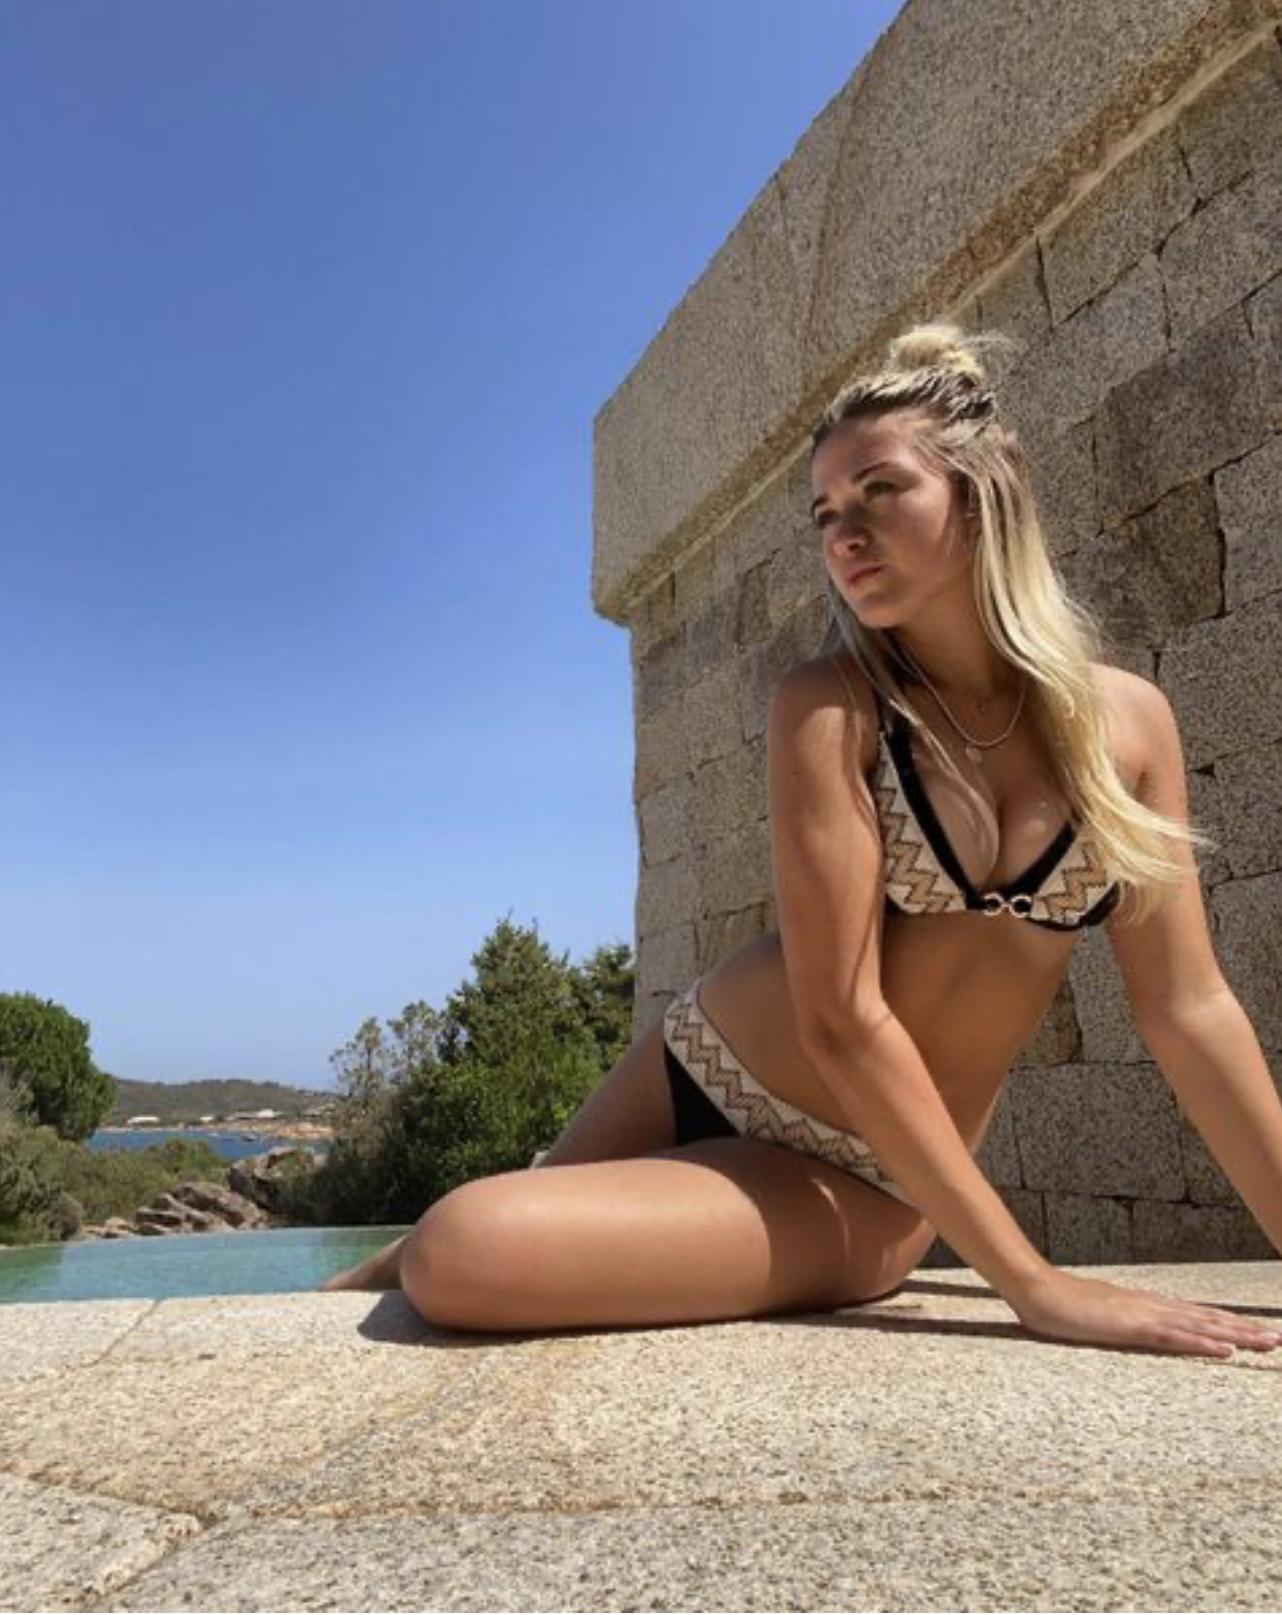 София Кальцетти — девушка  форварда «Манчестер Сити» Серхио Агуэро.Ради неё футболист променяет Манчестер на Барселону!